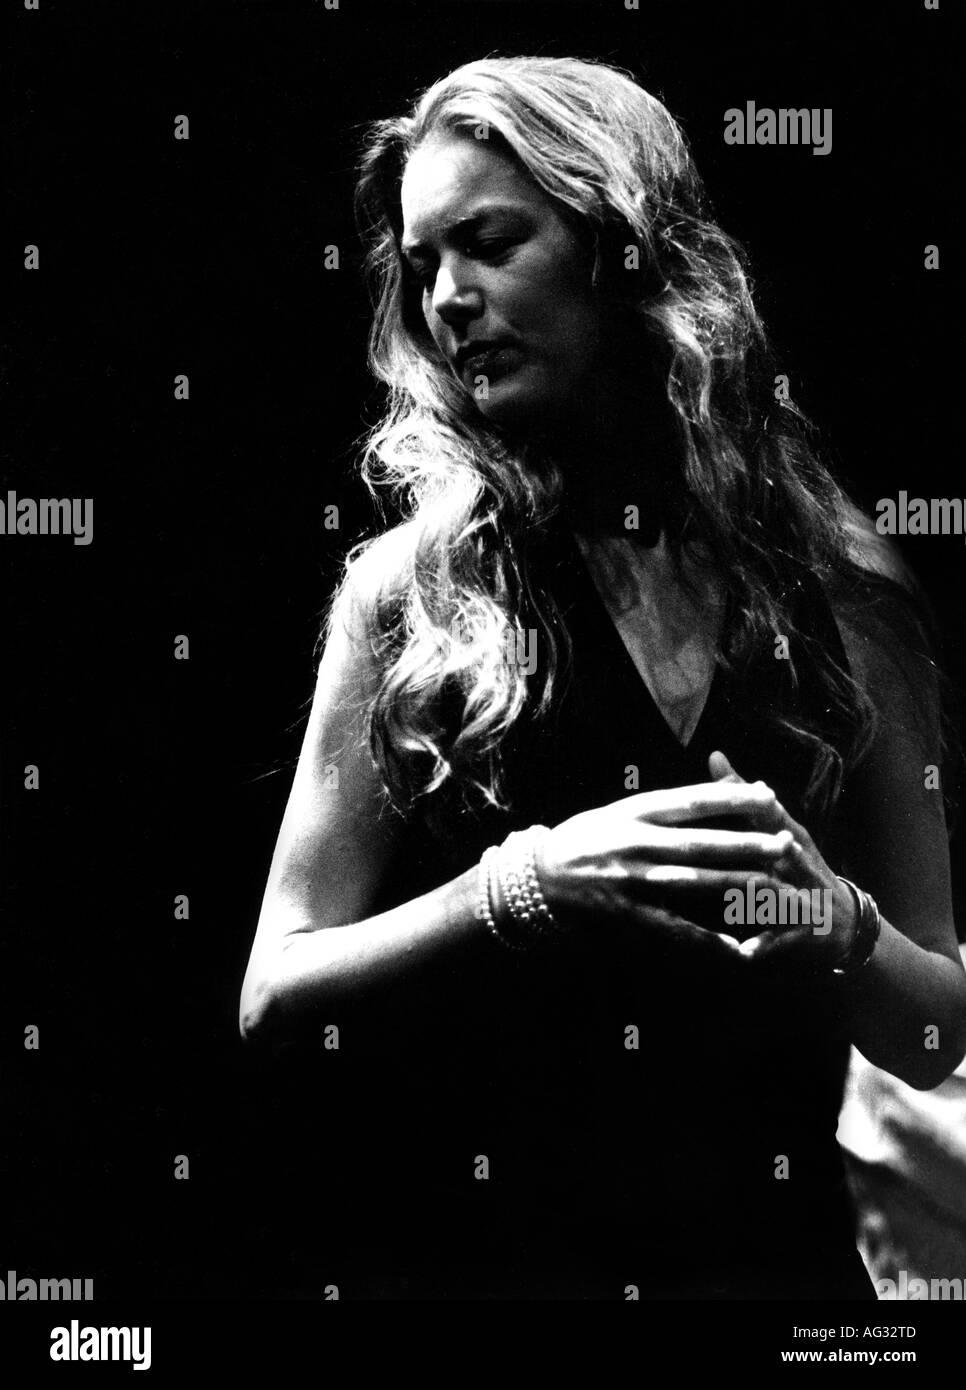 Bakken, Rebekka, * 1970, Norwegian singer (Jazz), half length, live performance, Stuttgart, April 2003, Additional-Rights-Clearances-NA - Stock Image